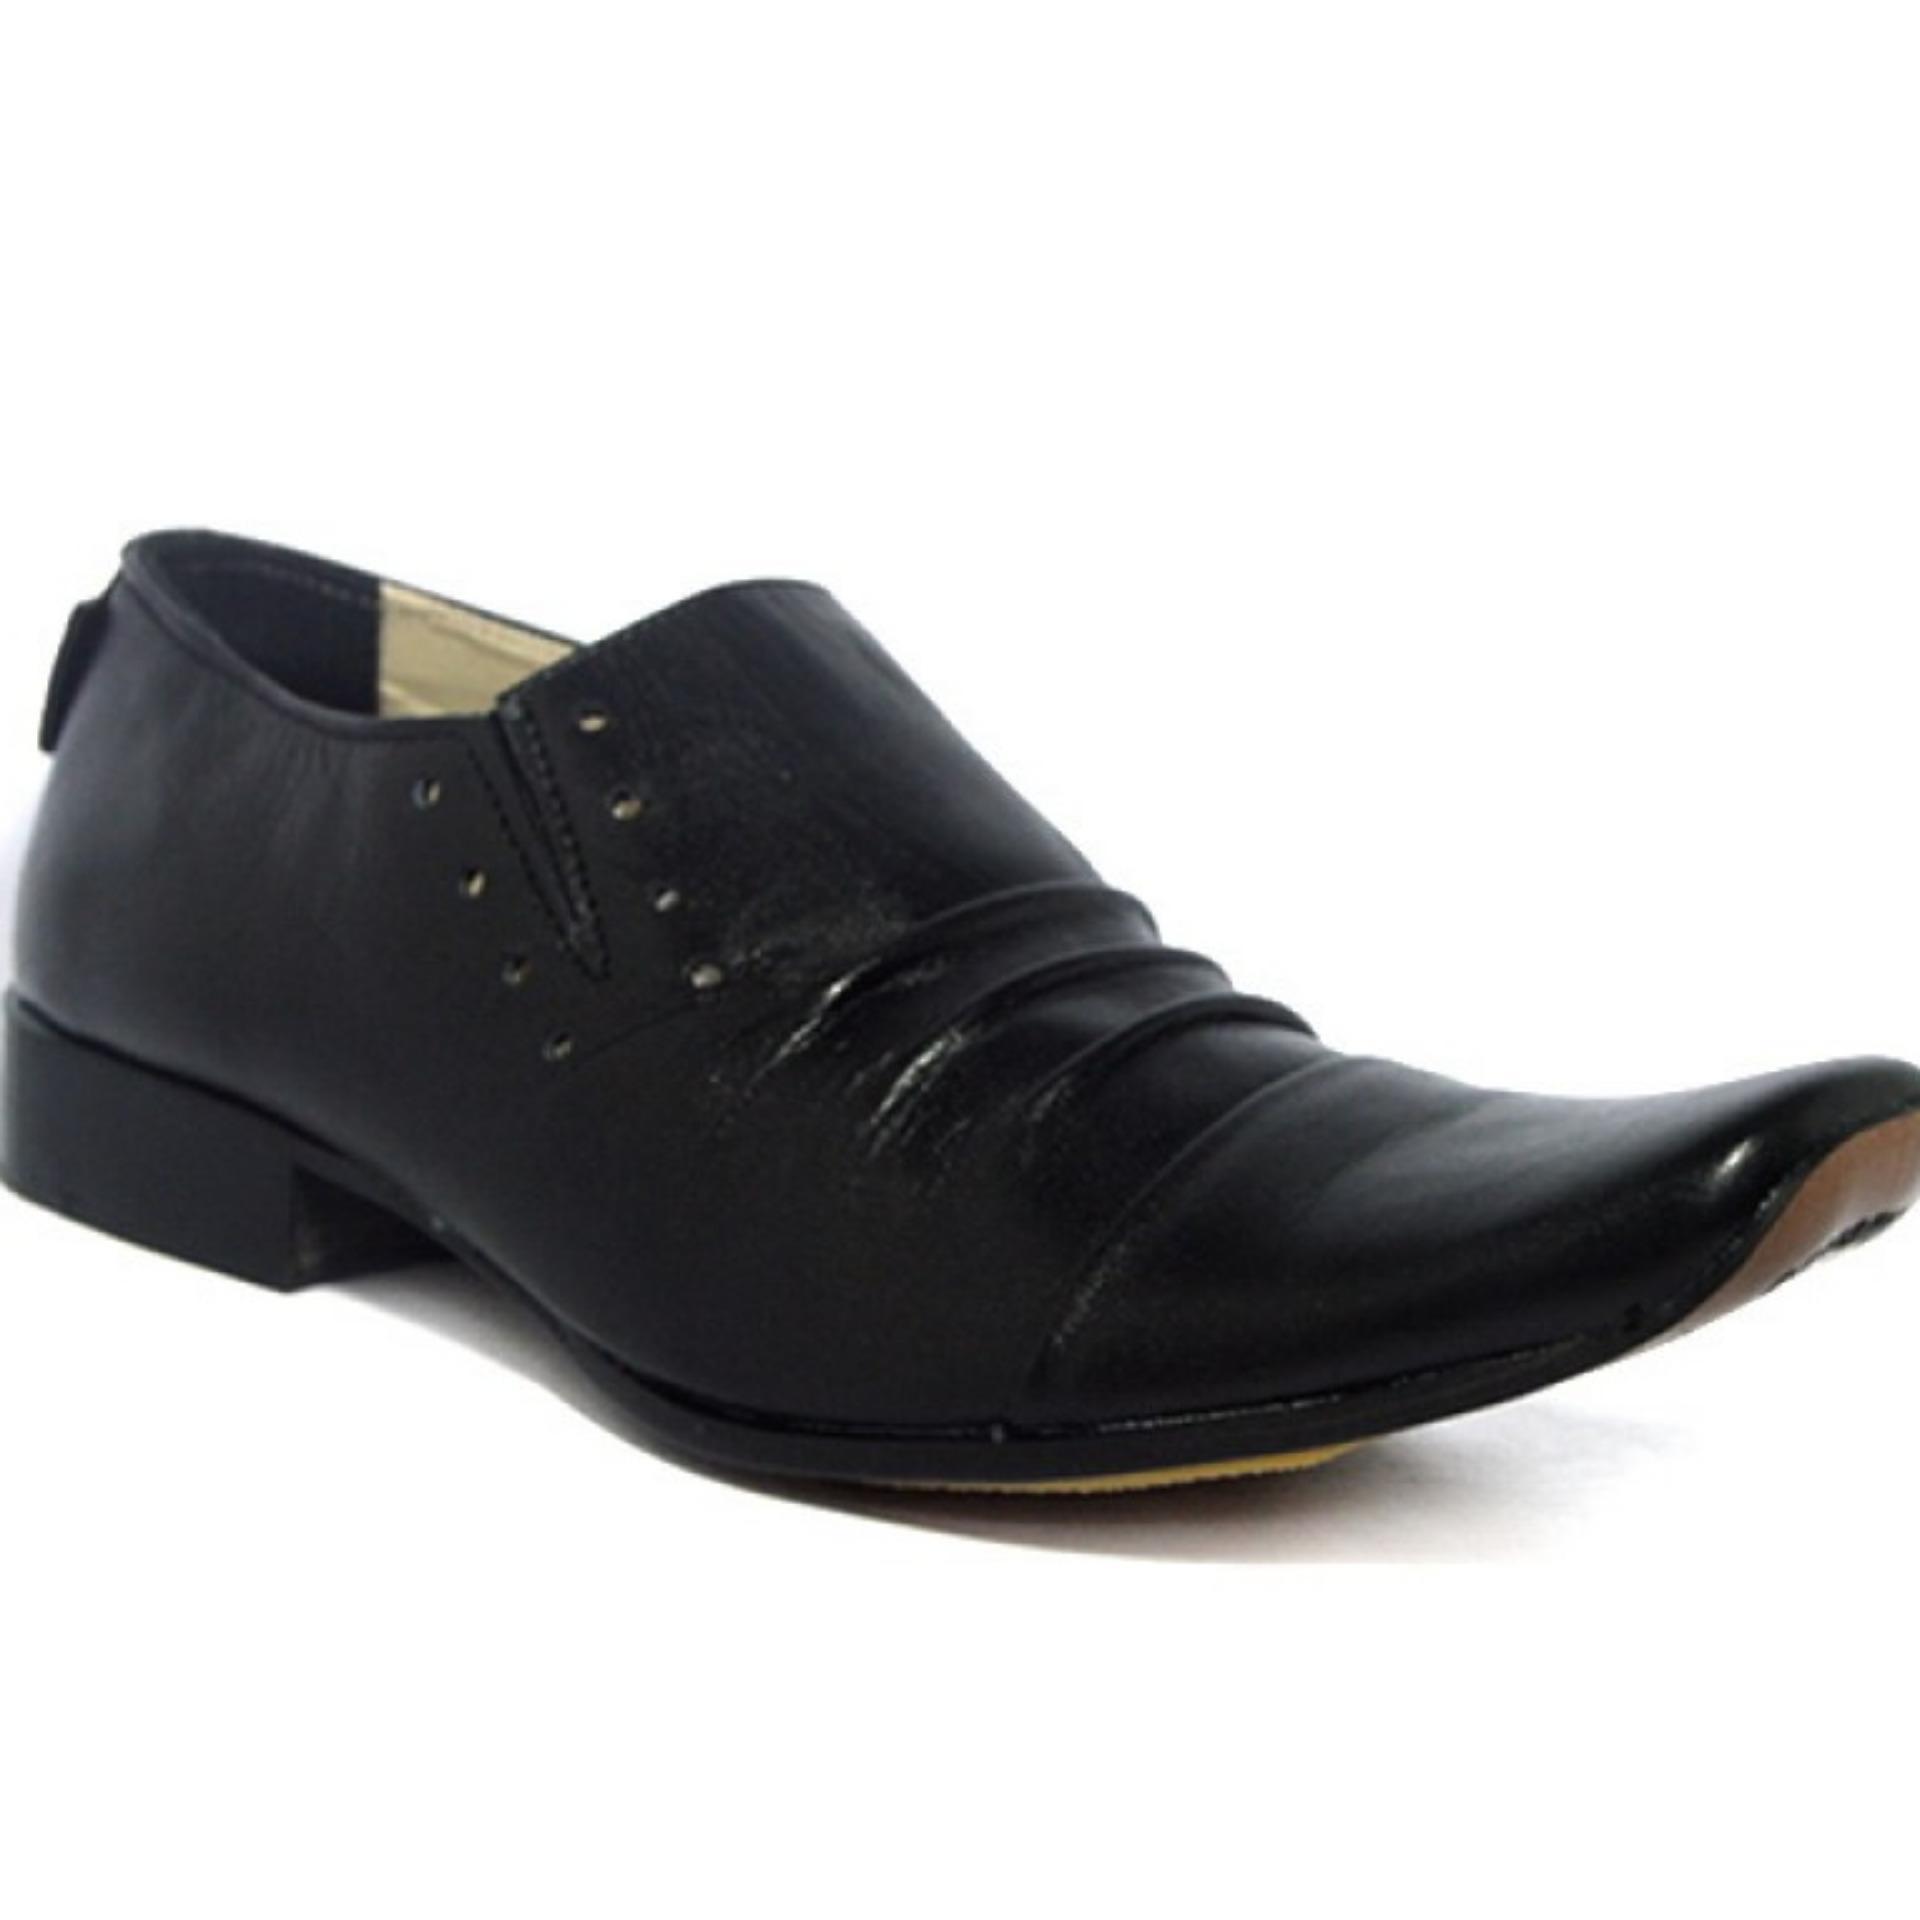 Toko Sepatu Pantopel Pria Sepatu Kulit Asli Cevany Kulit Remple Hitam Online